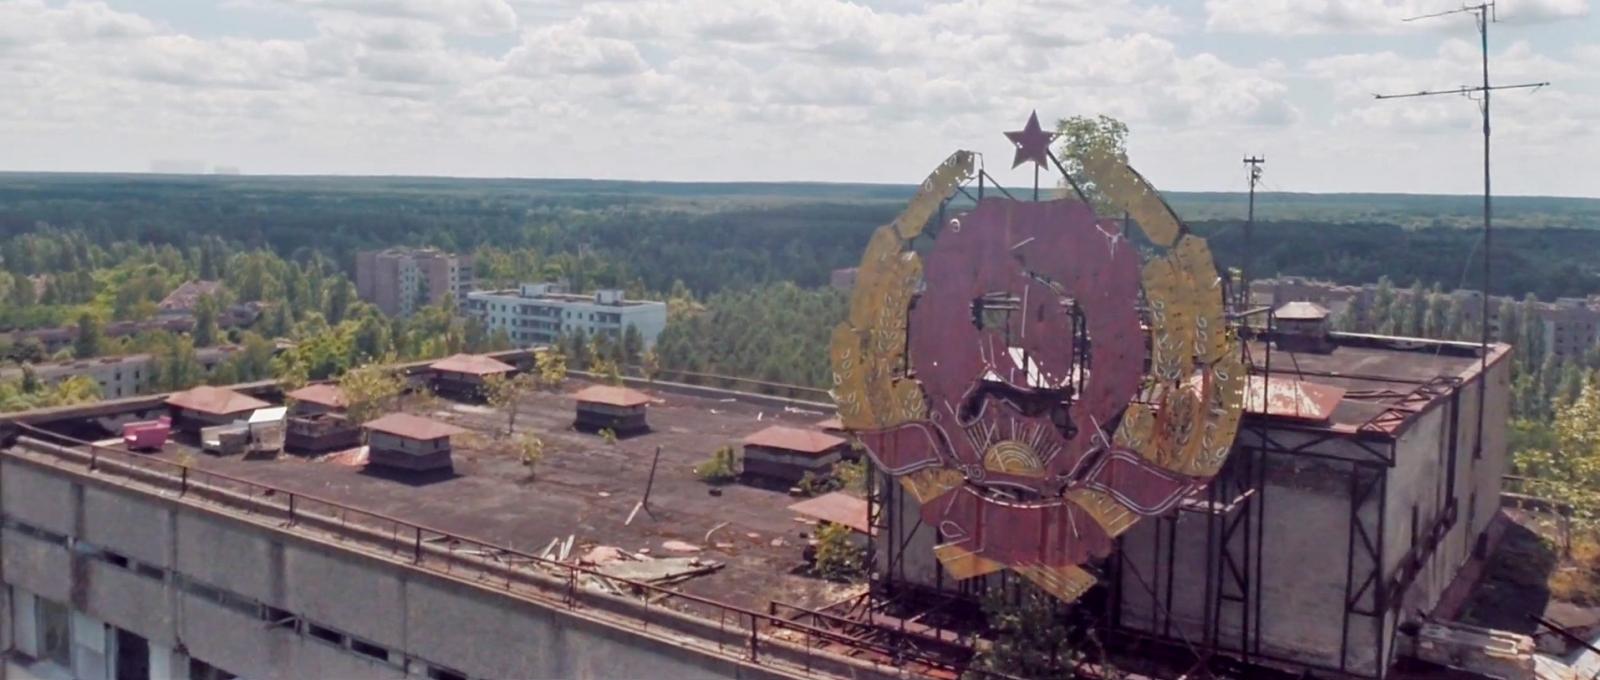 Soviet billboard on a building in the city of Pripyat